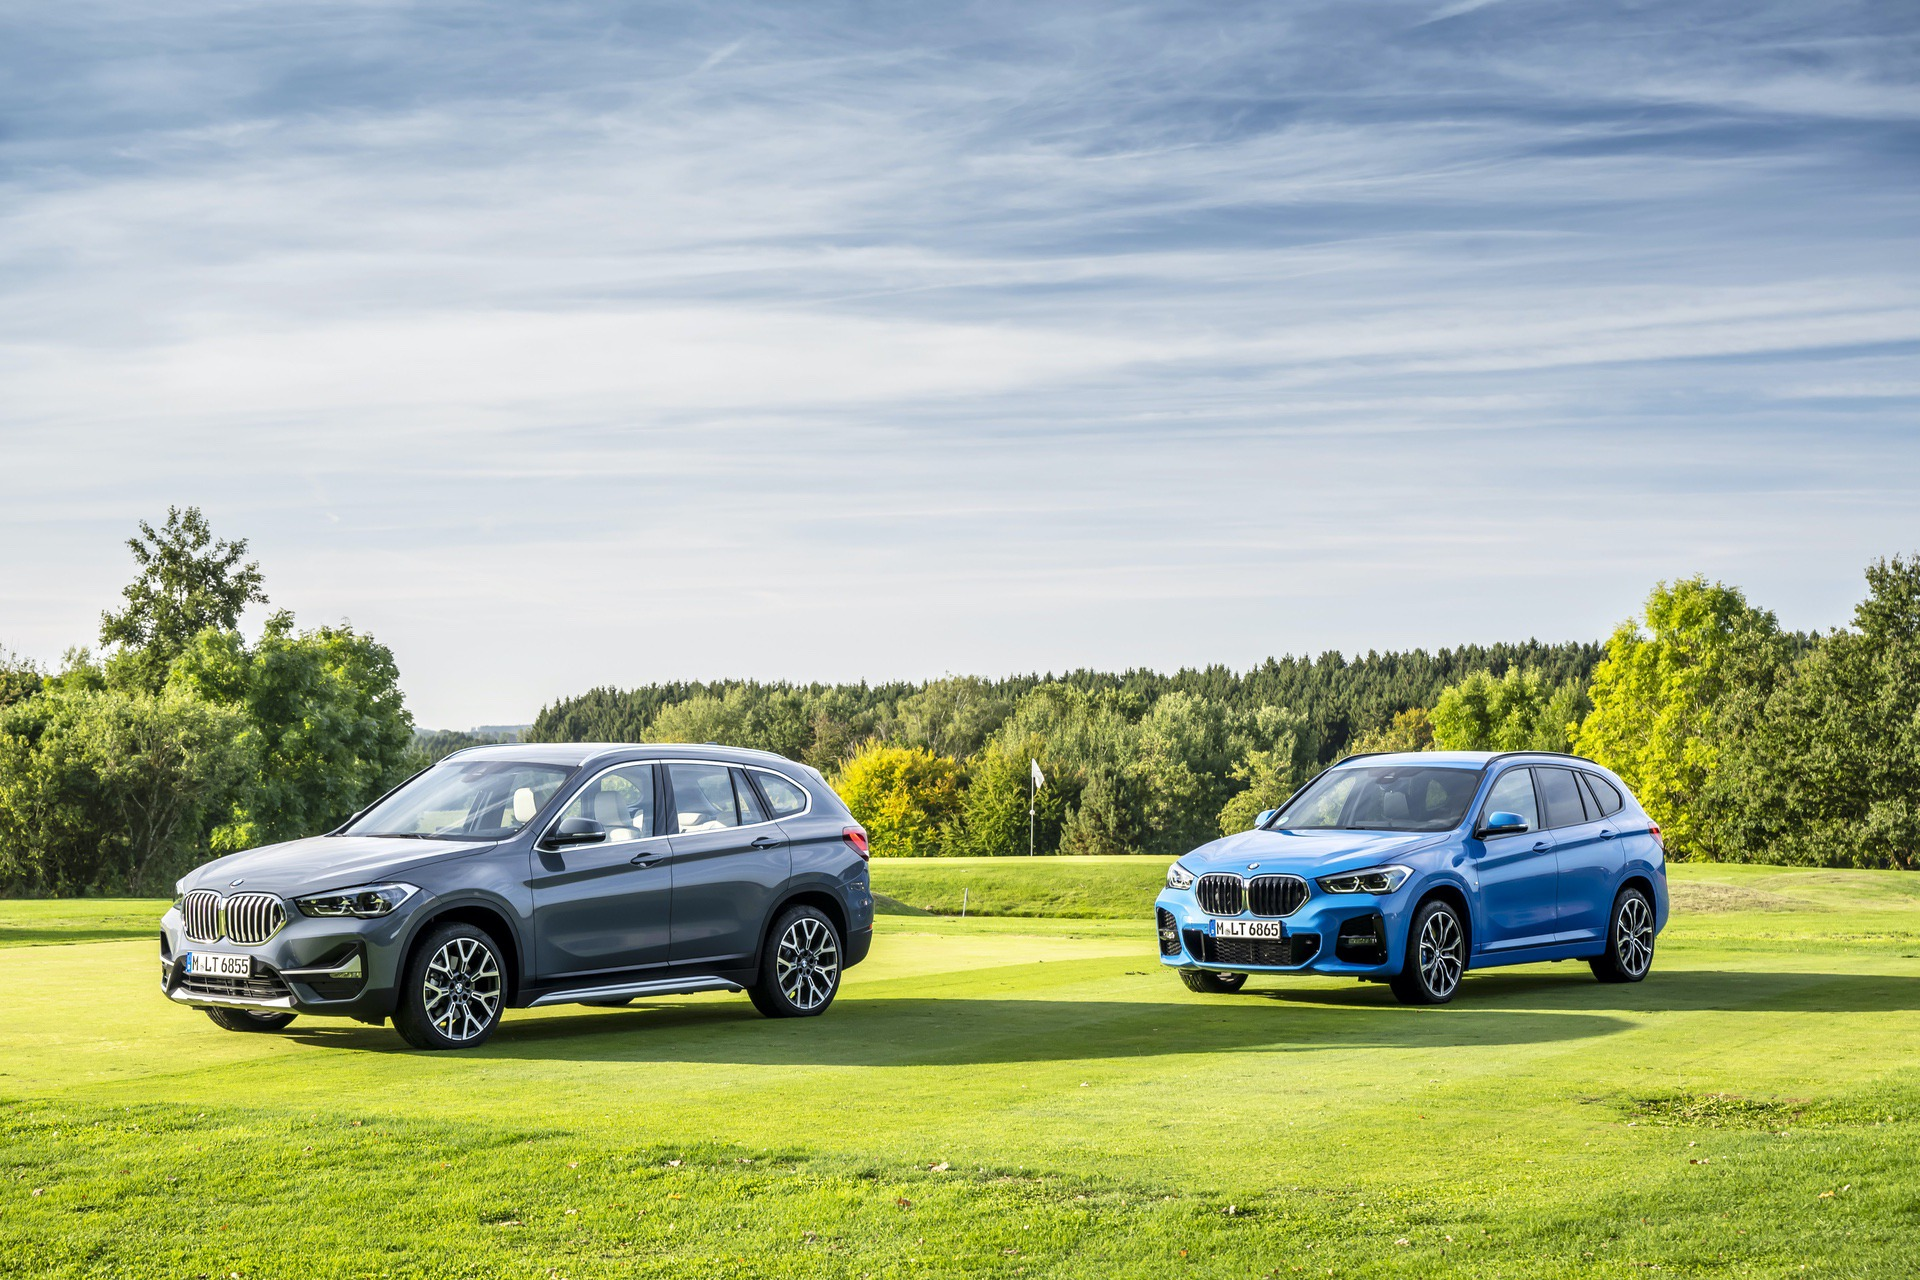 2019 BMW X1 facelift 0